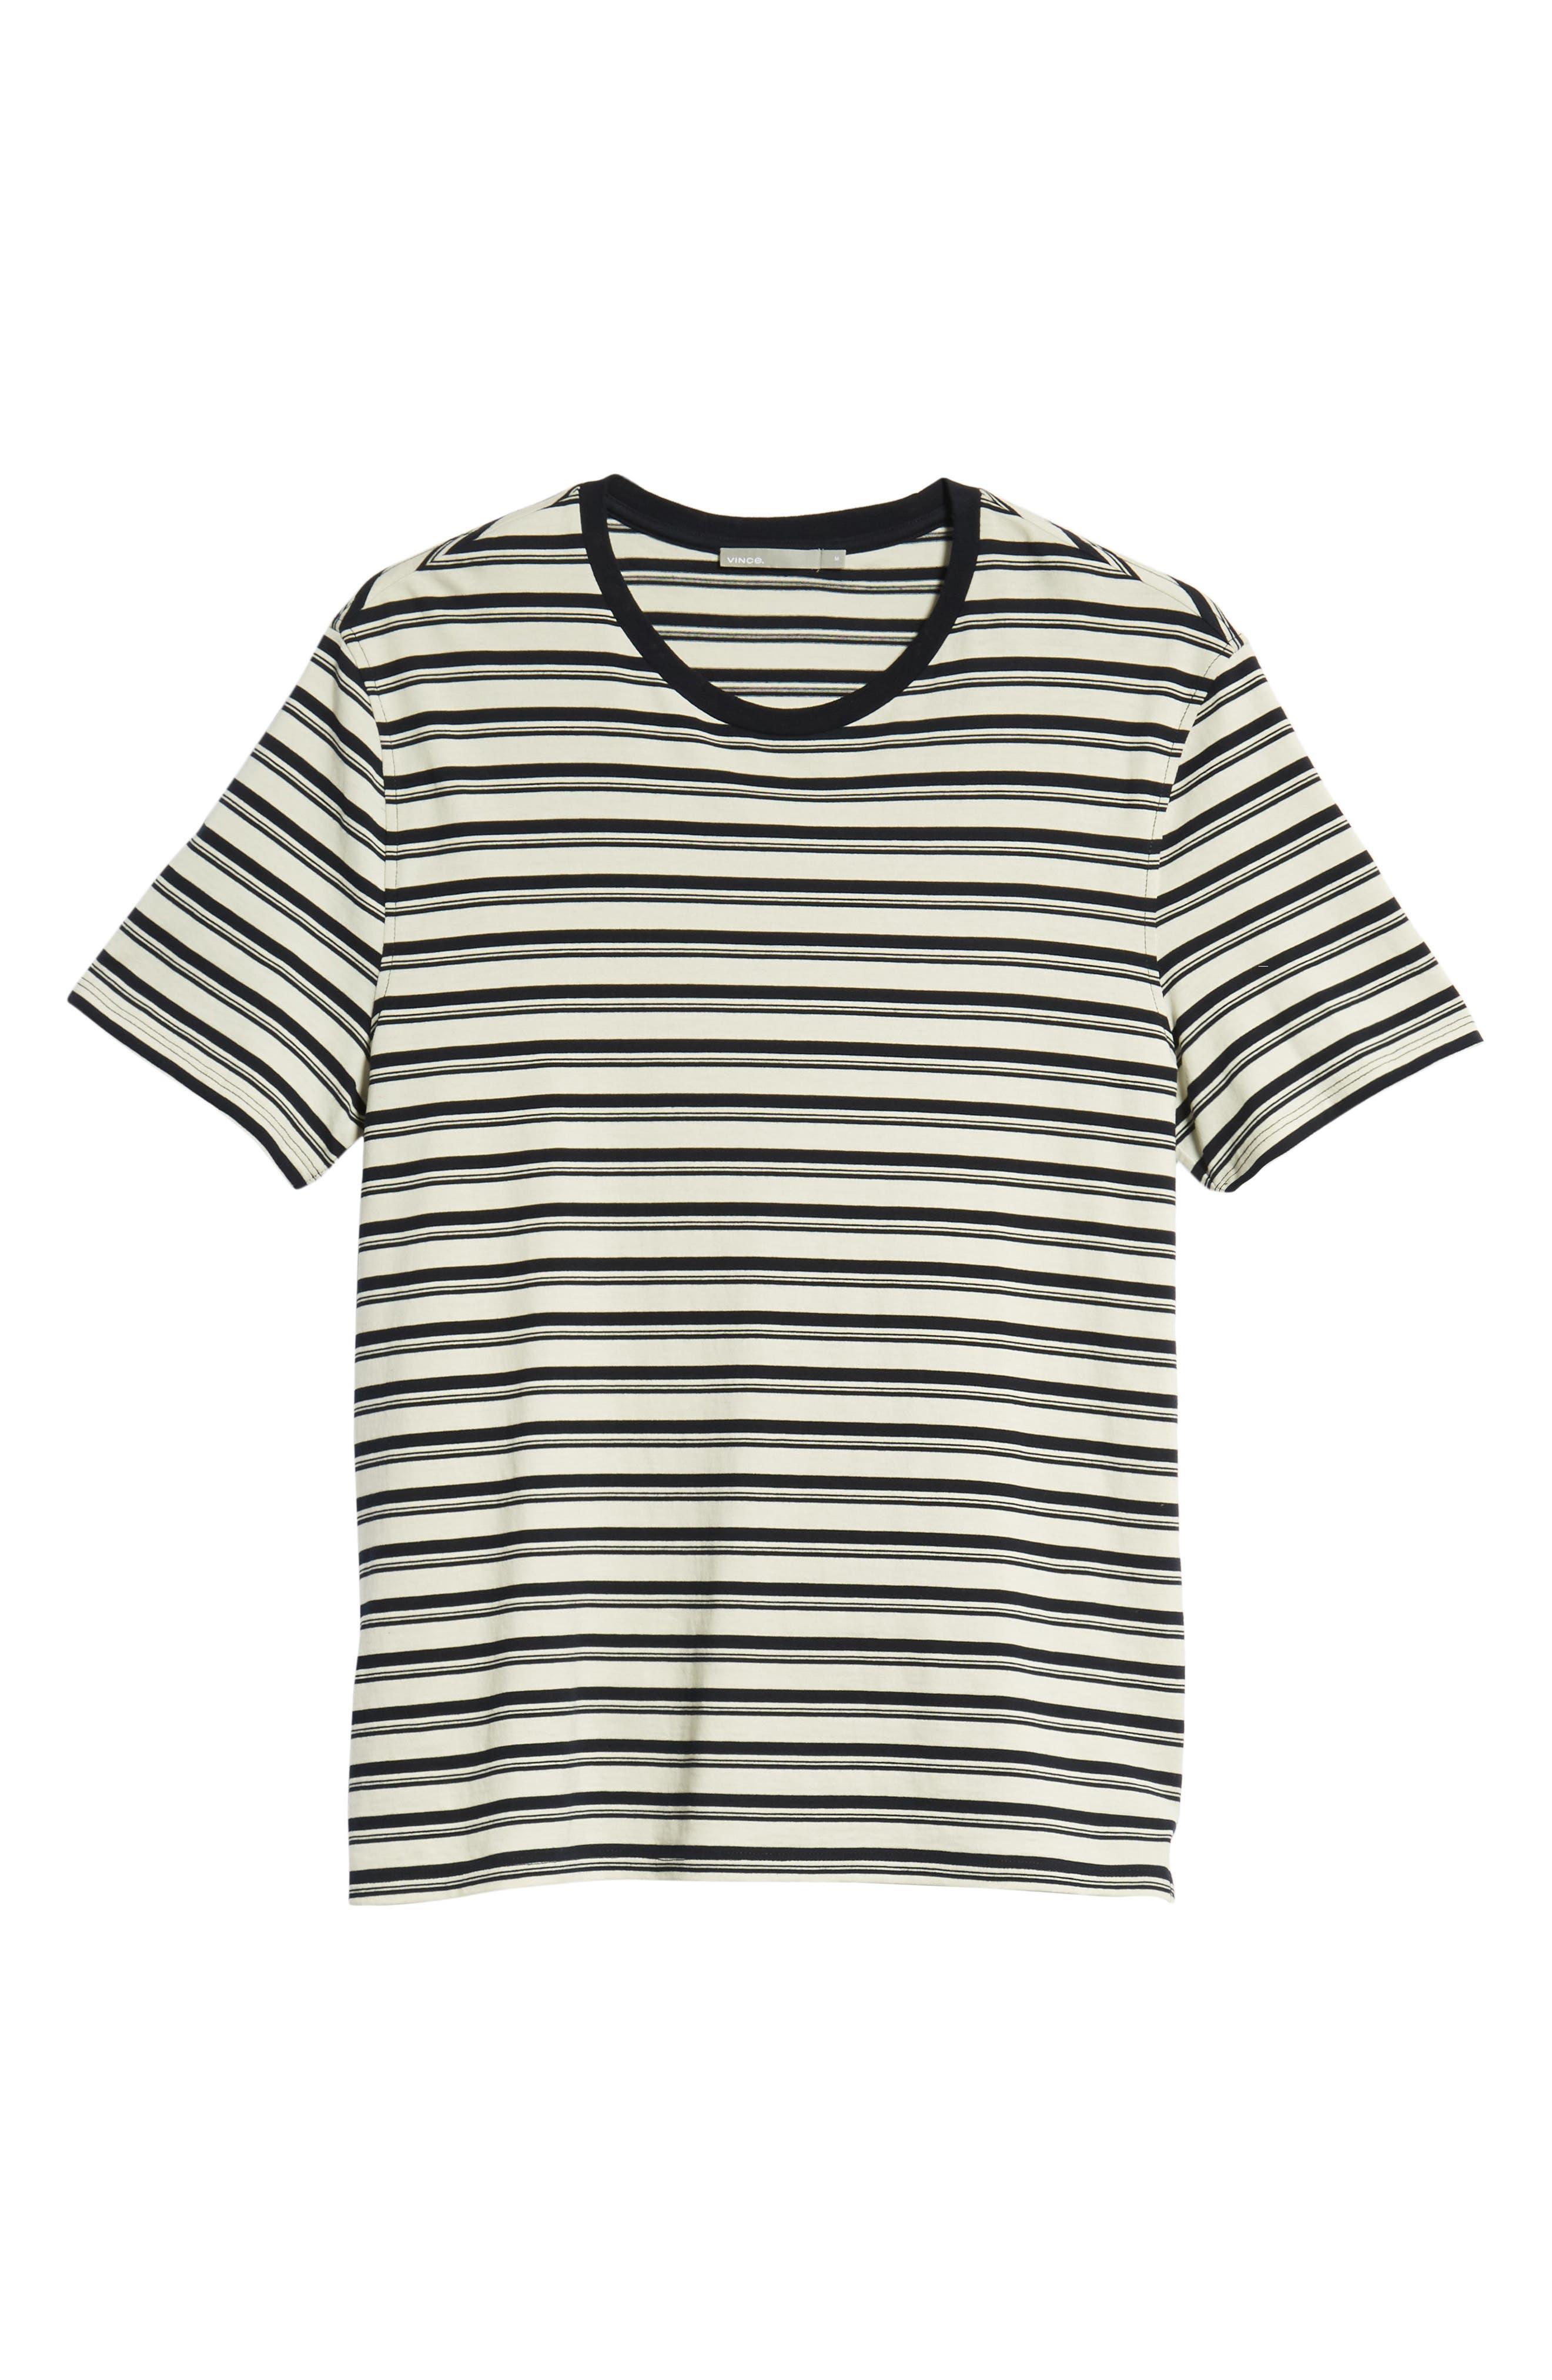 Variegated Stripe Regular Fit Cotton Crewneck T-Shirt,                             Alternate thumbnail 6, color,                             400